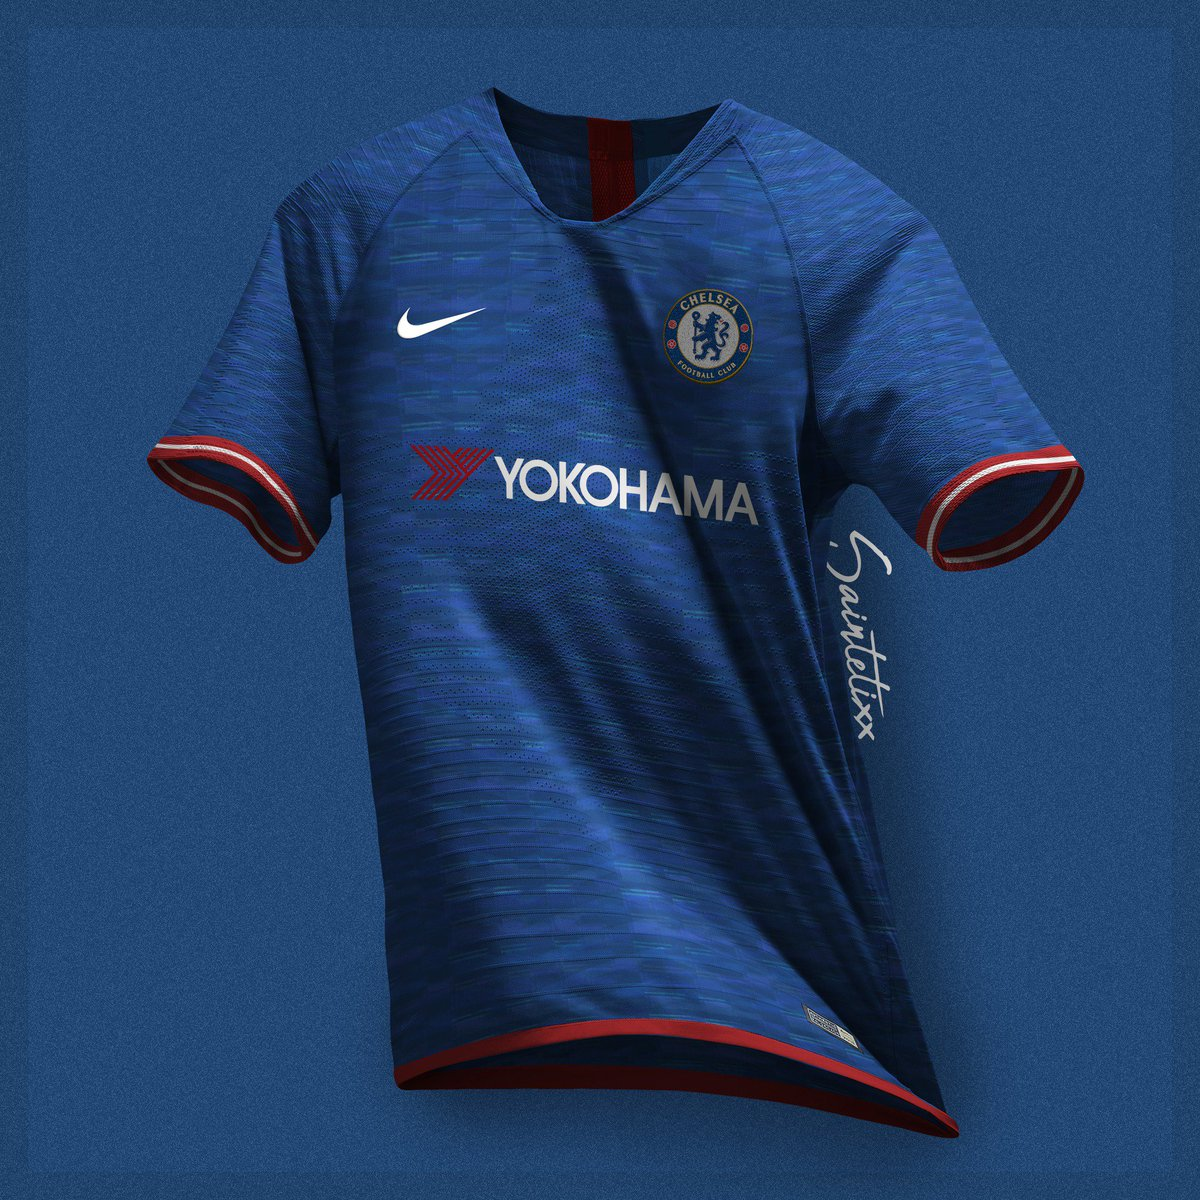 eabb928d143 Chelsea FC x Nike 19 20 concept kits . Mockup    rupertalbe  CFC  Chelsea   ChelseaFC  Giroud  Kanté  Hazard  Sarri  Bluespic.twitter.com 8IdFuQvp6W